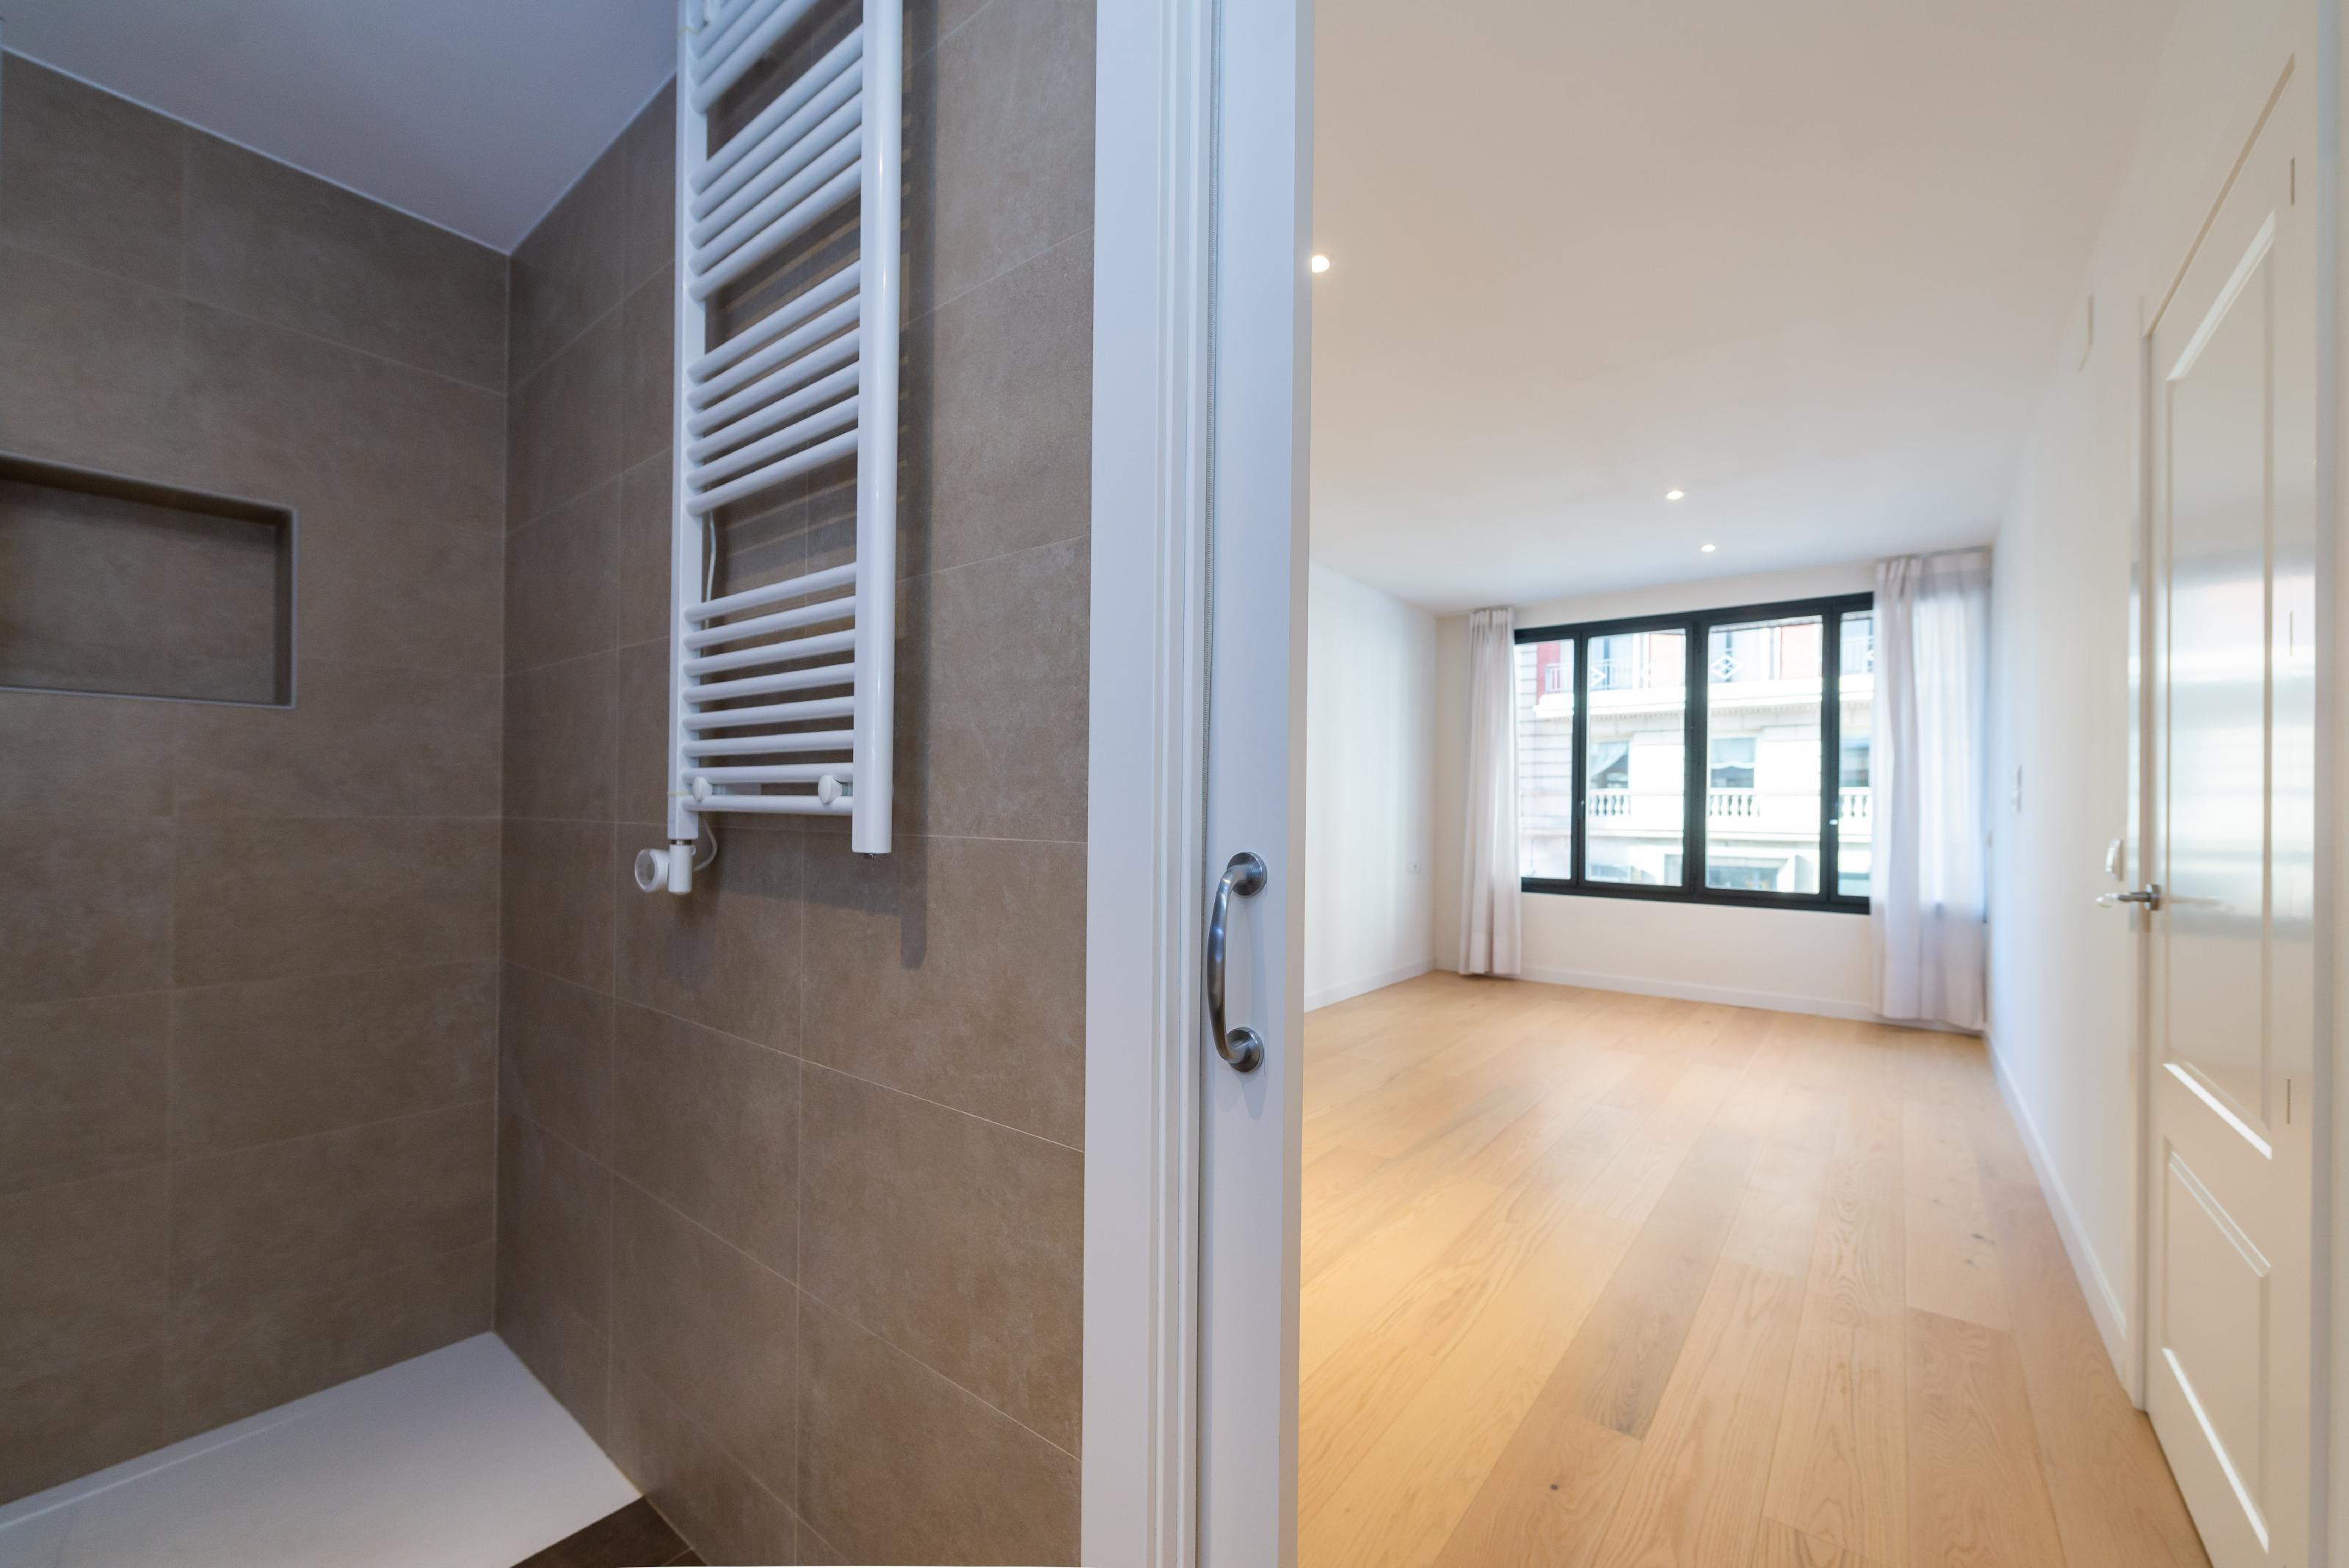 245231 Flat for sale in Sarrià-Sant Gervasi, Sant Gervasi-Galvany 27